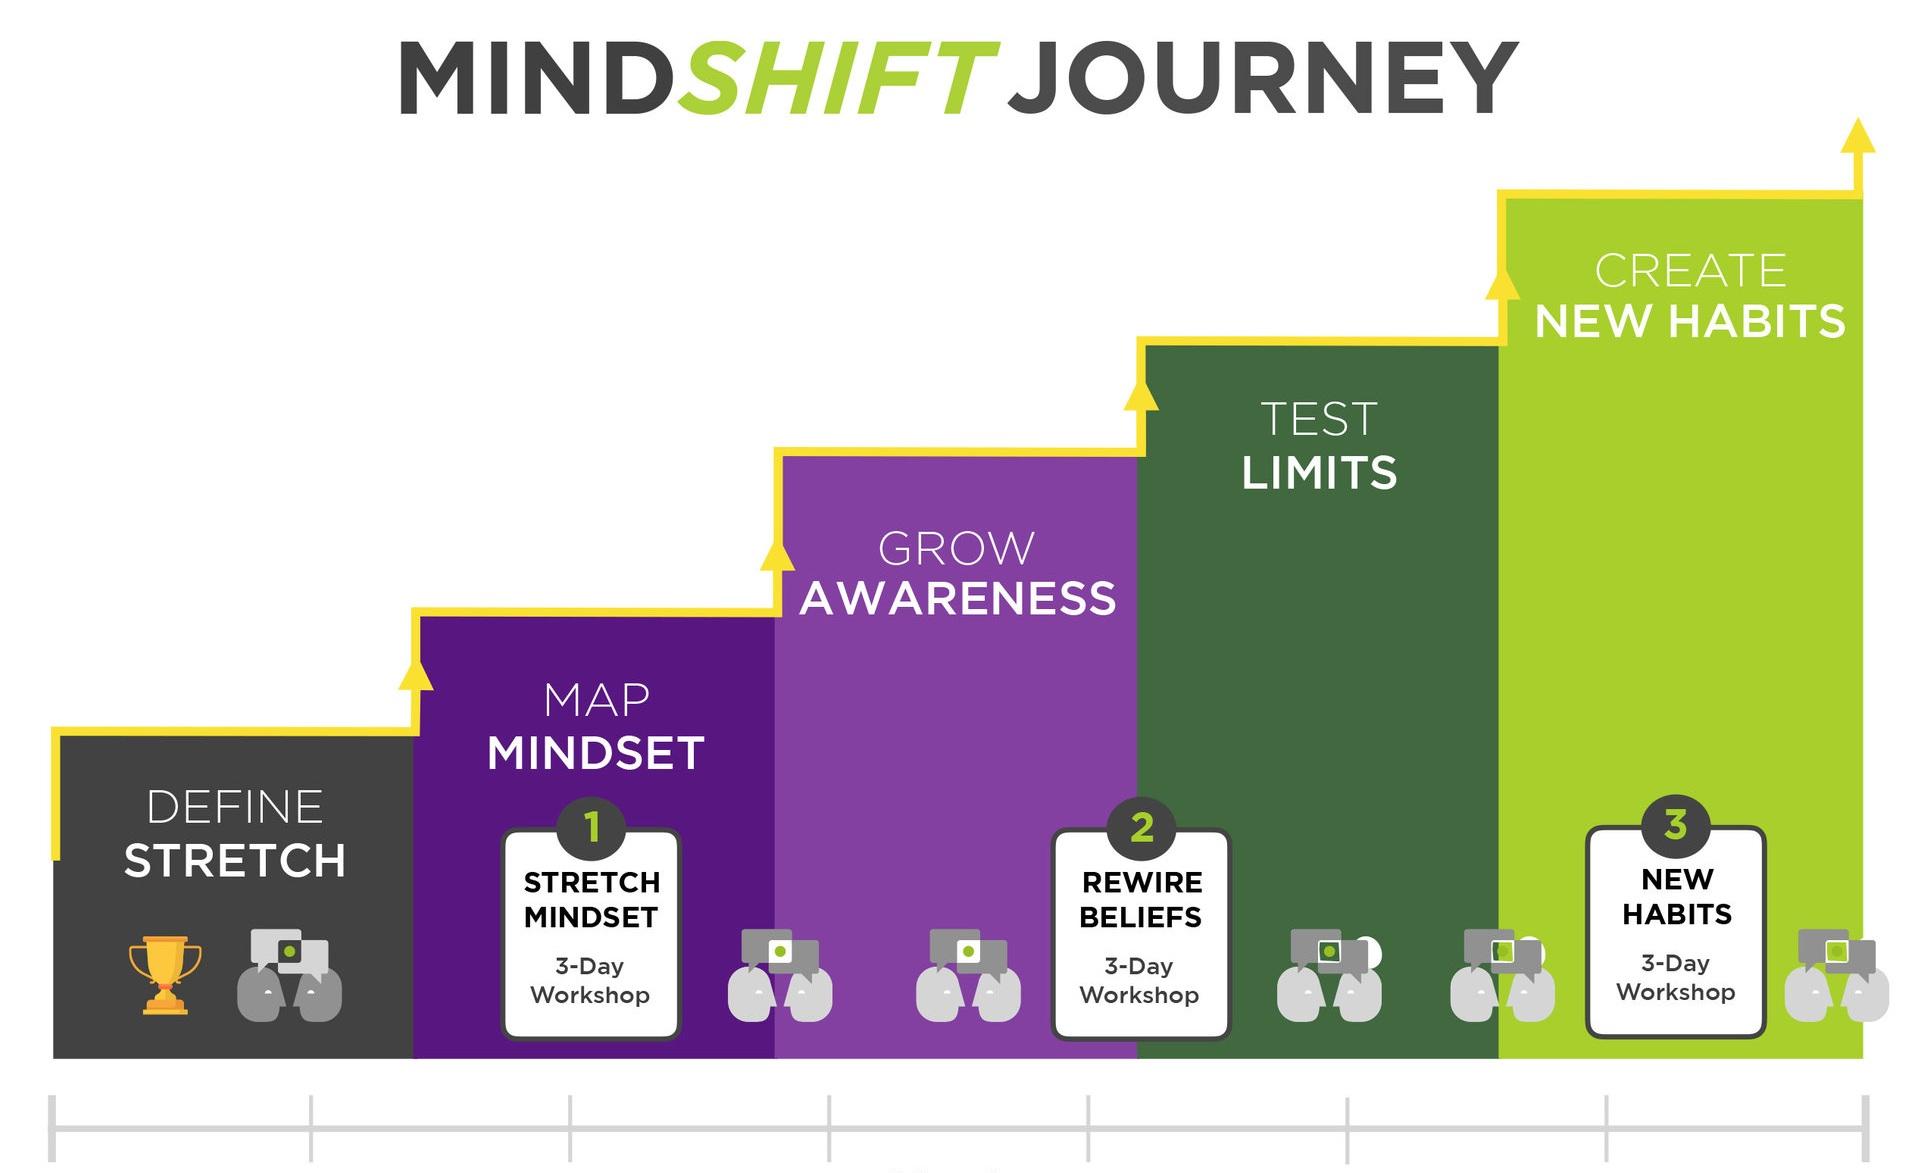 MindSHIFT+Journey+Image.jpg